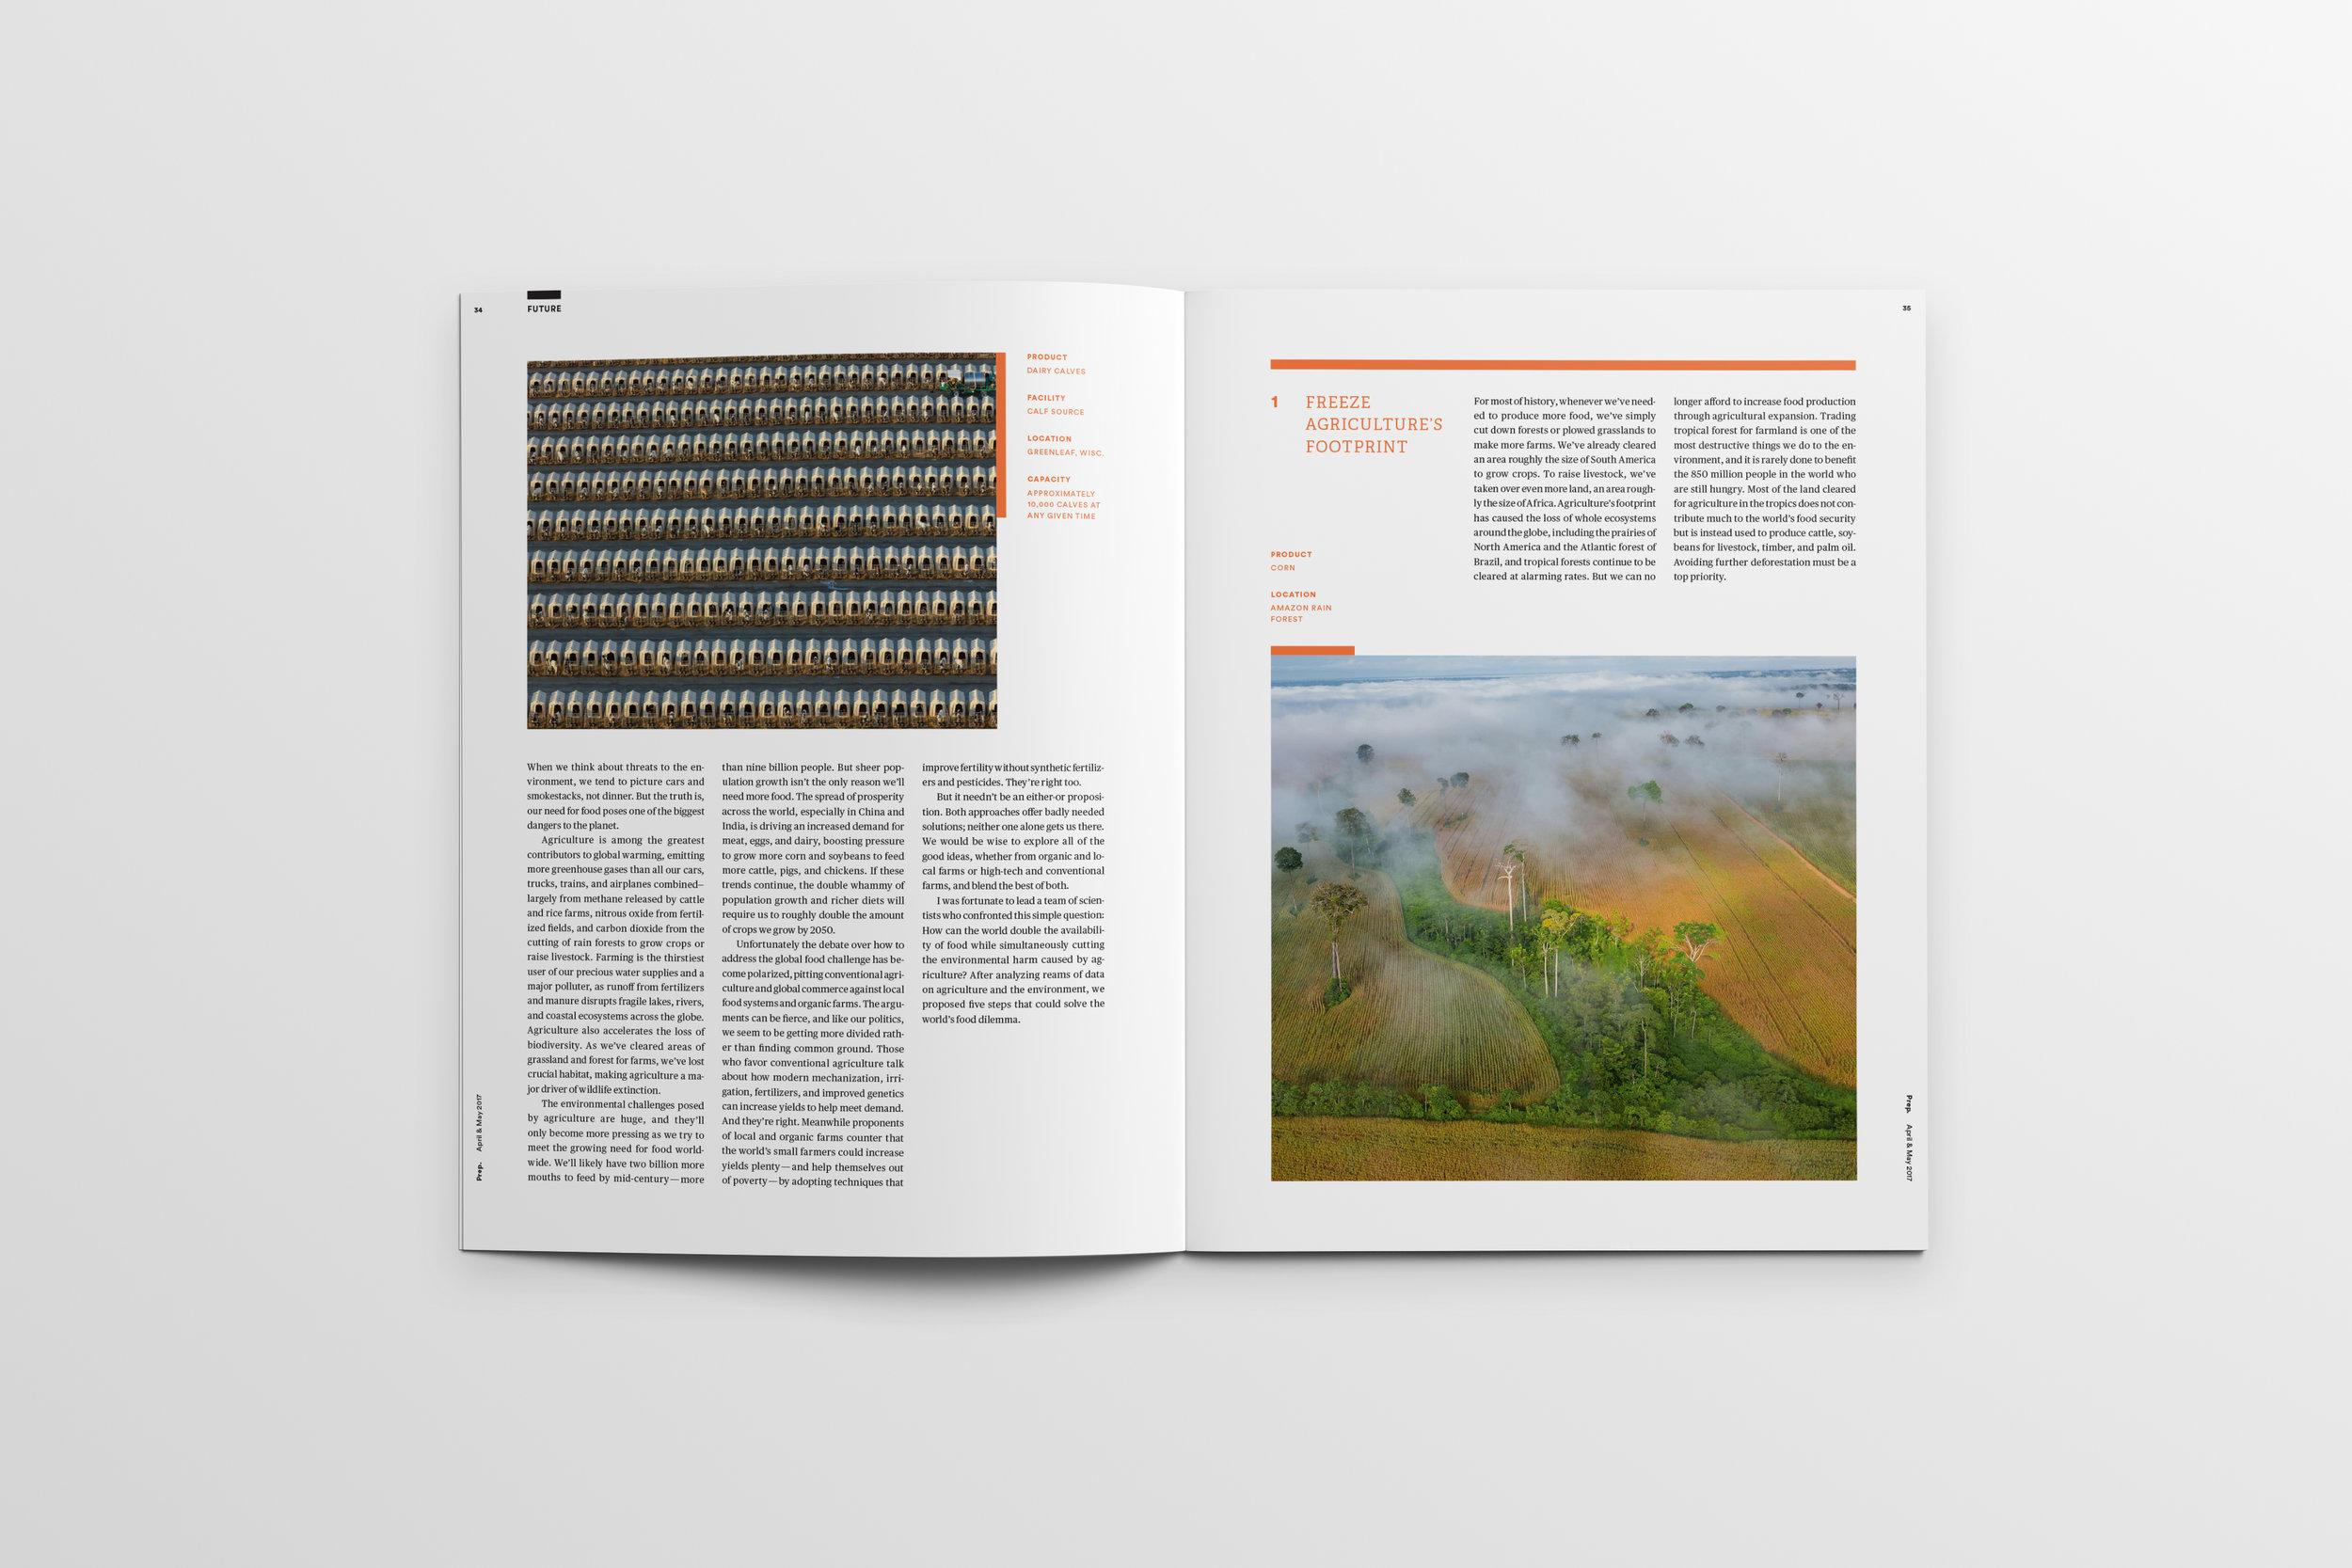 Magazine_Mockup_Pages34-35.jpg